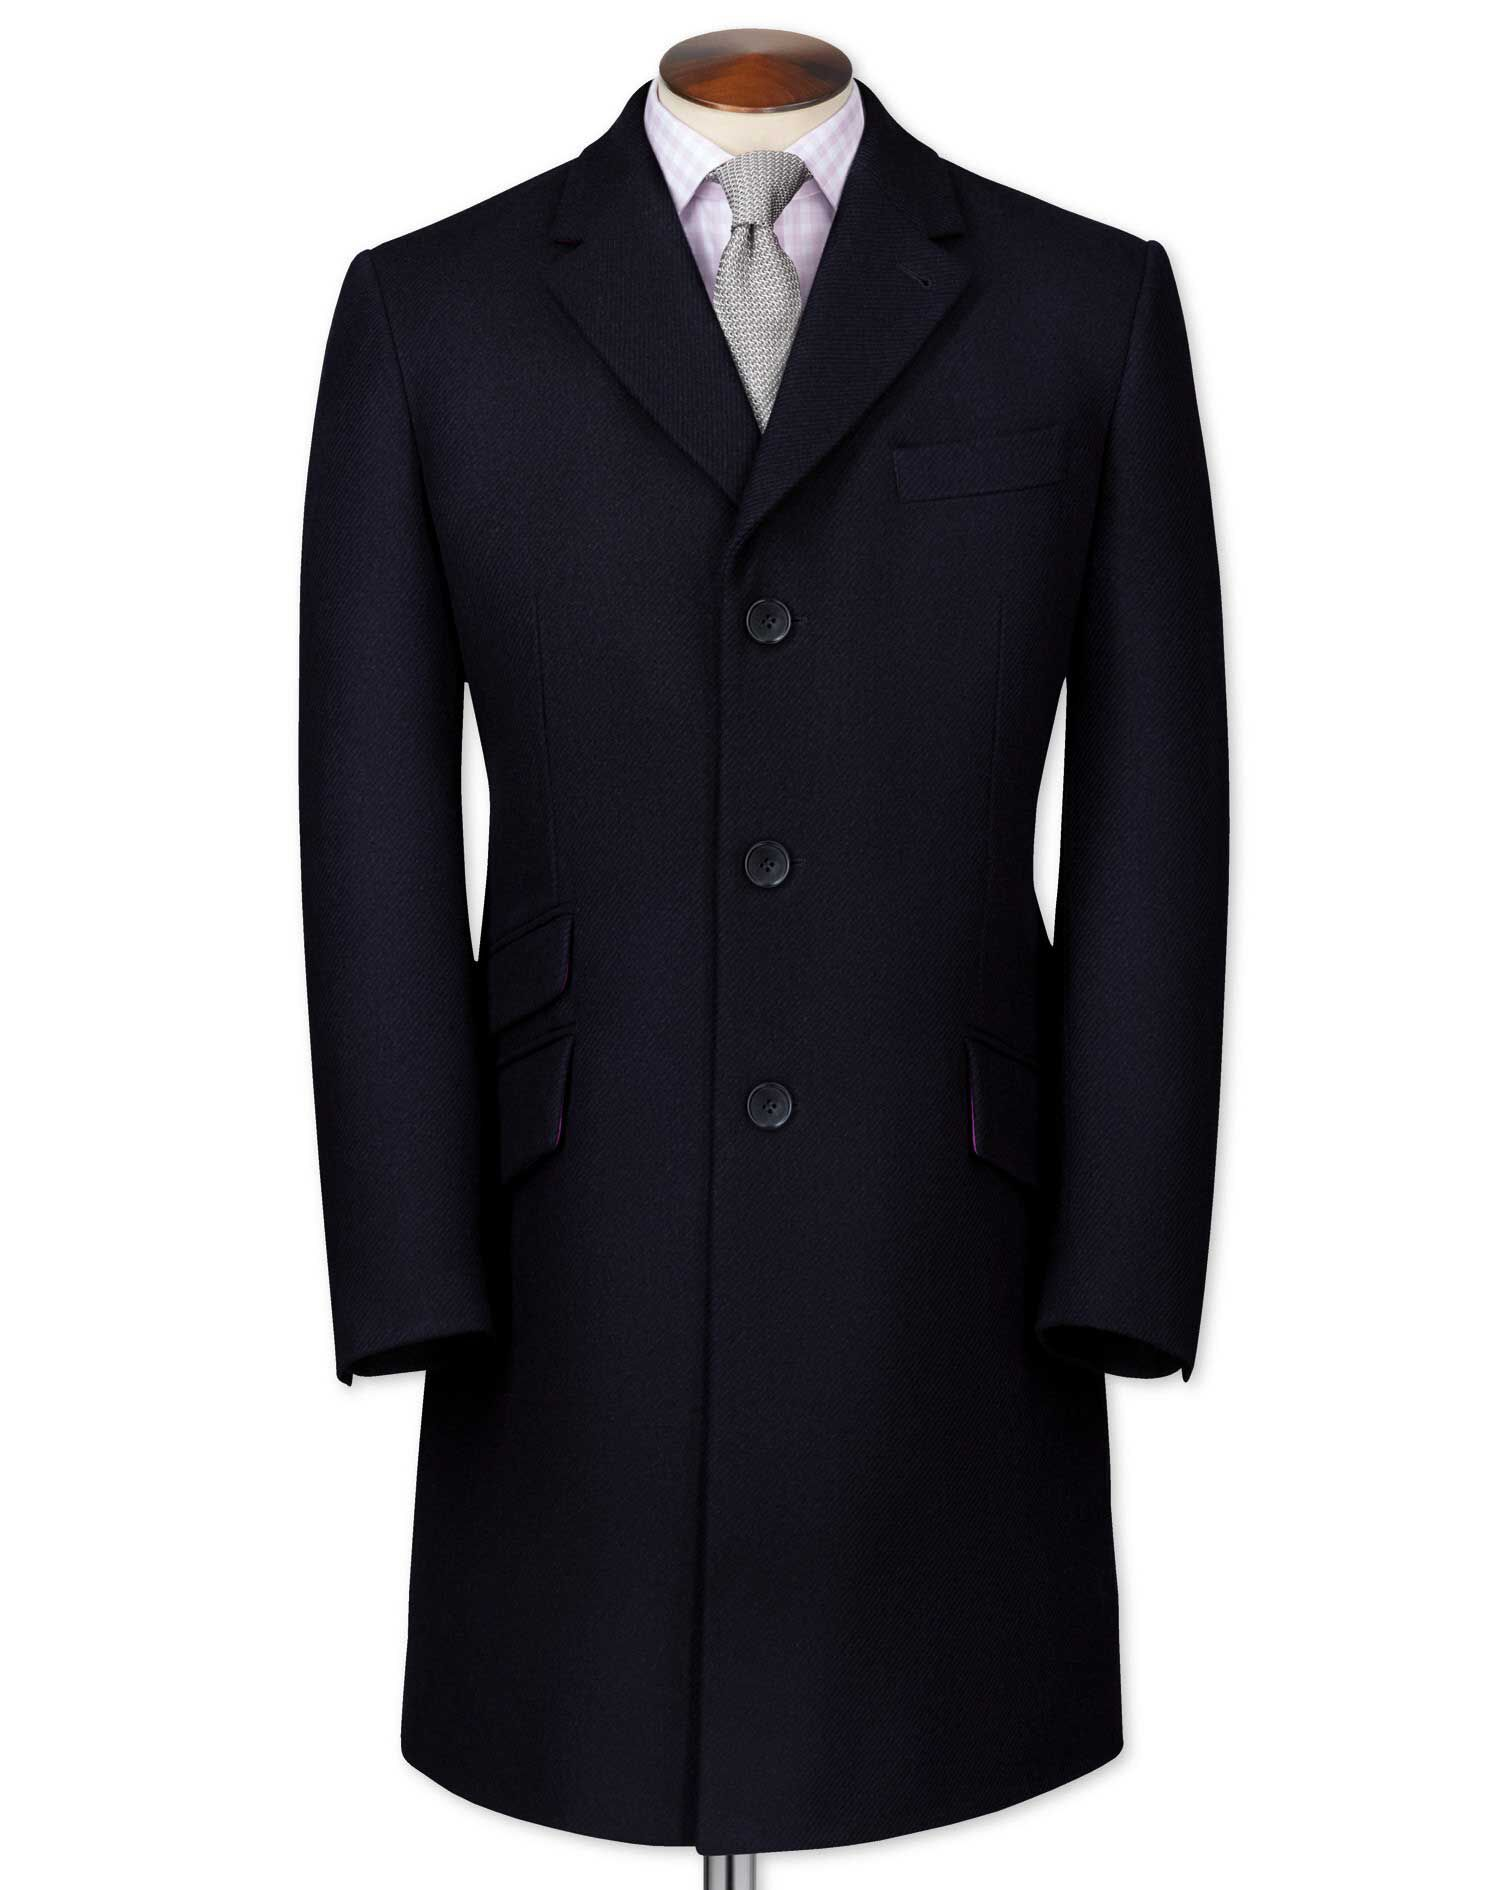 1950s Men's Jackets Slim Fit Navy Wool Epsom OverWool coat Size 46 Regular by Charles Tyrwhitt £99.00 AT vintagedancer.com